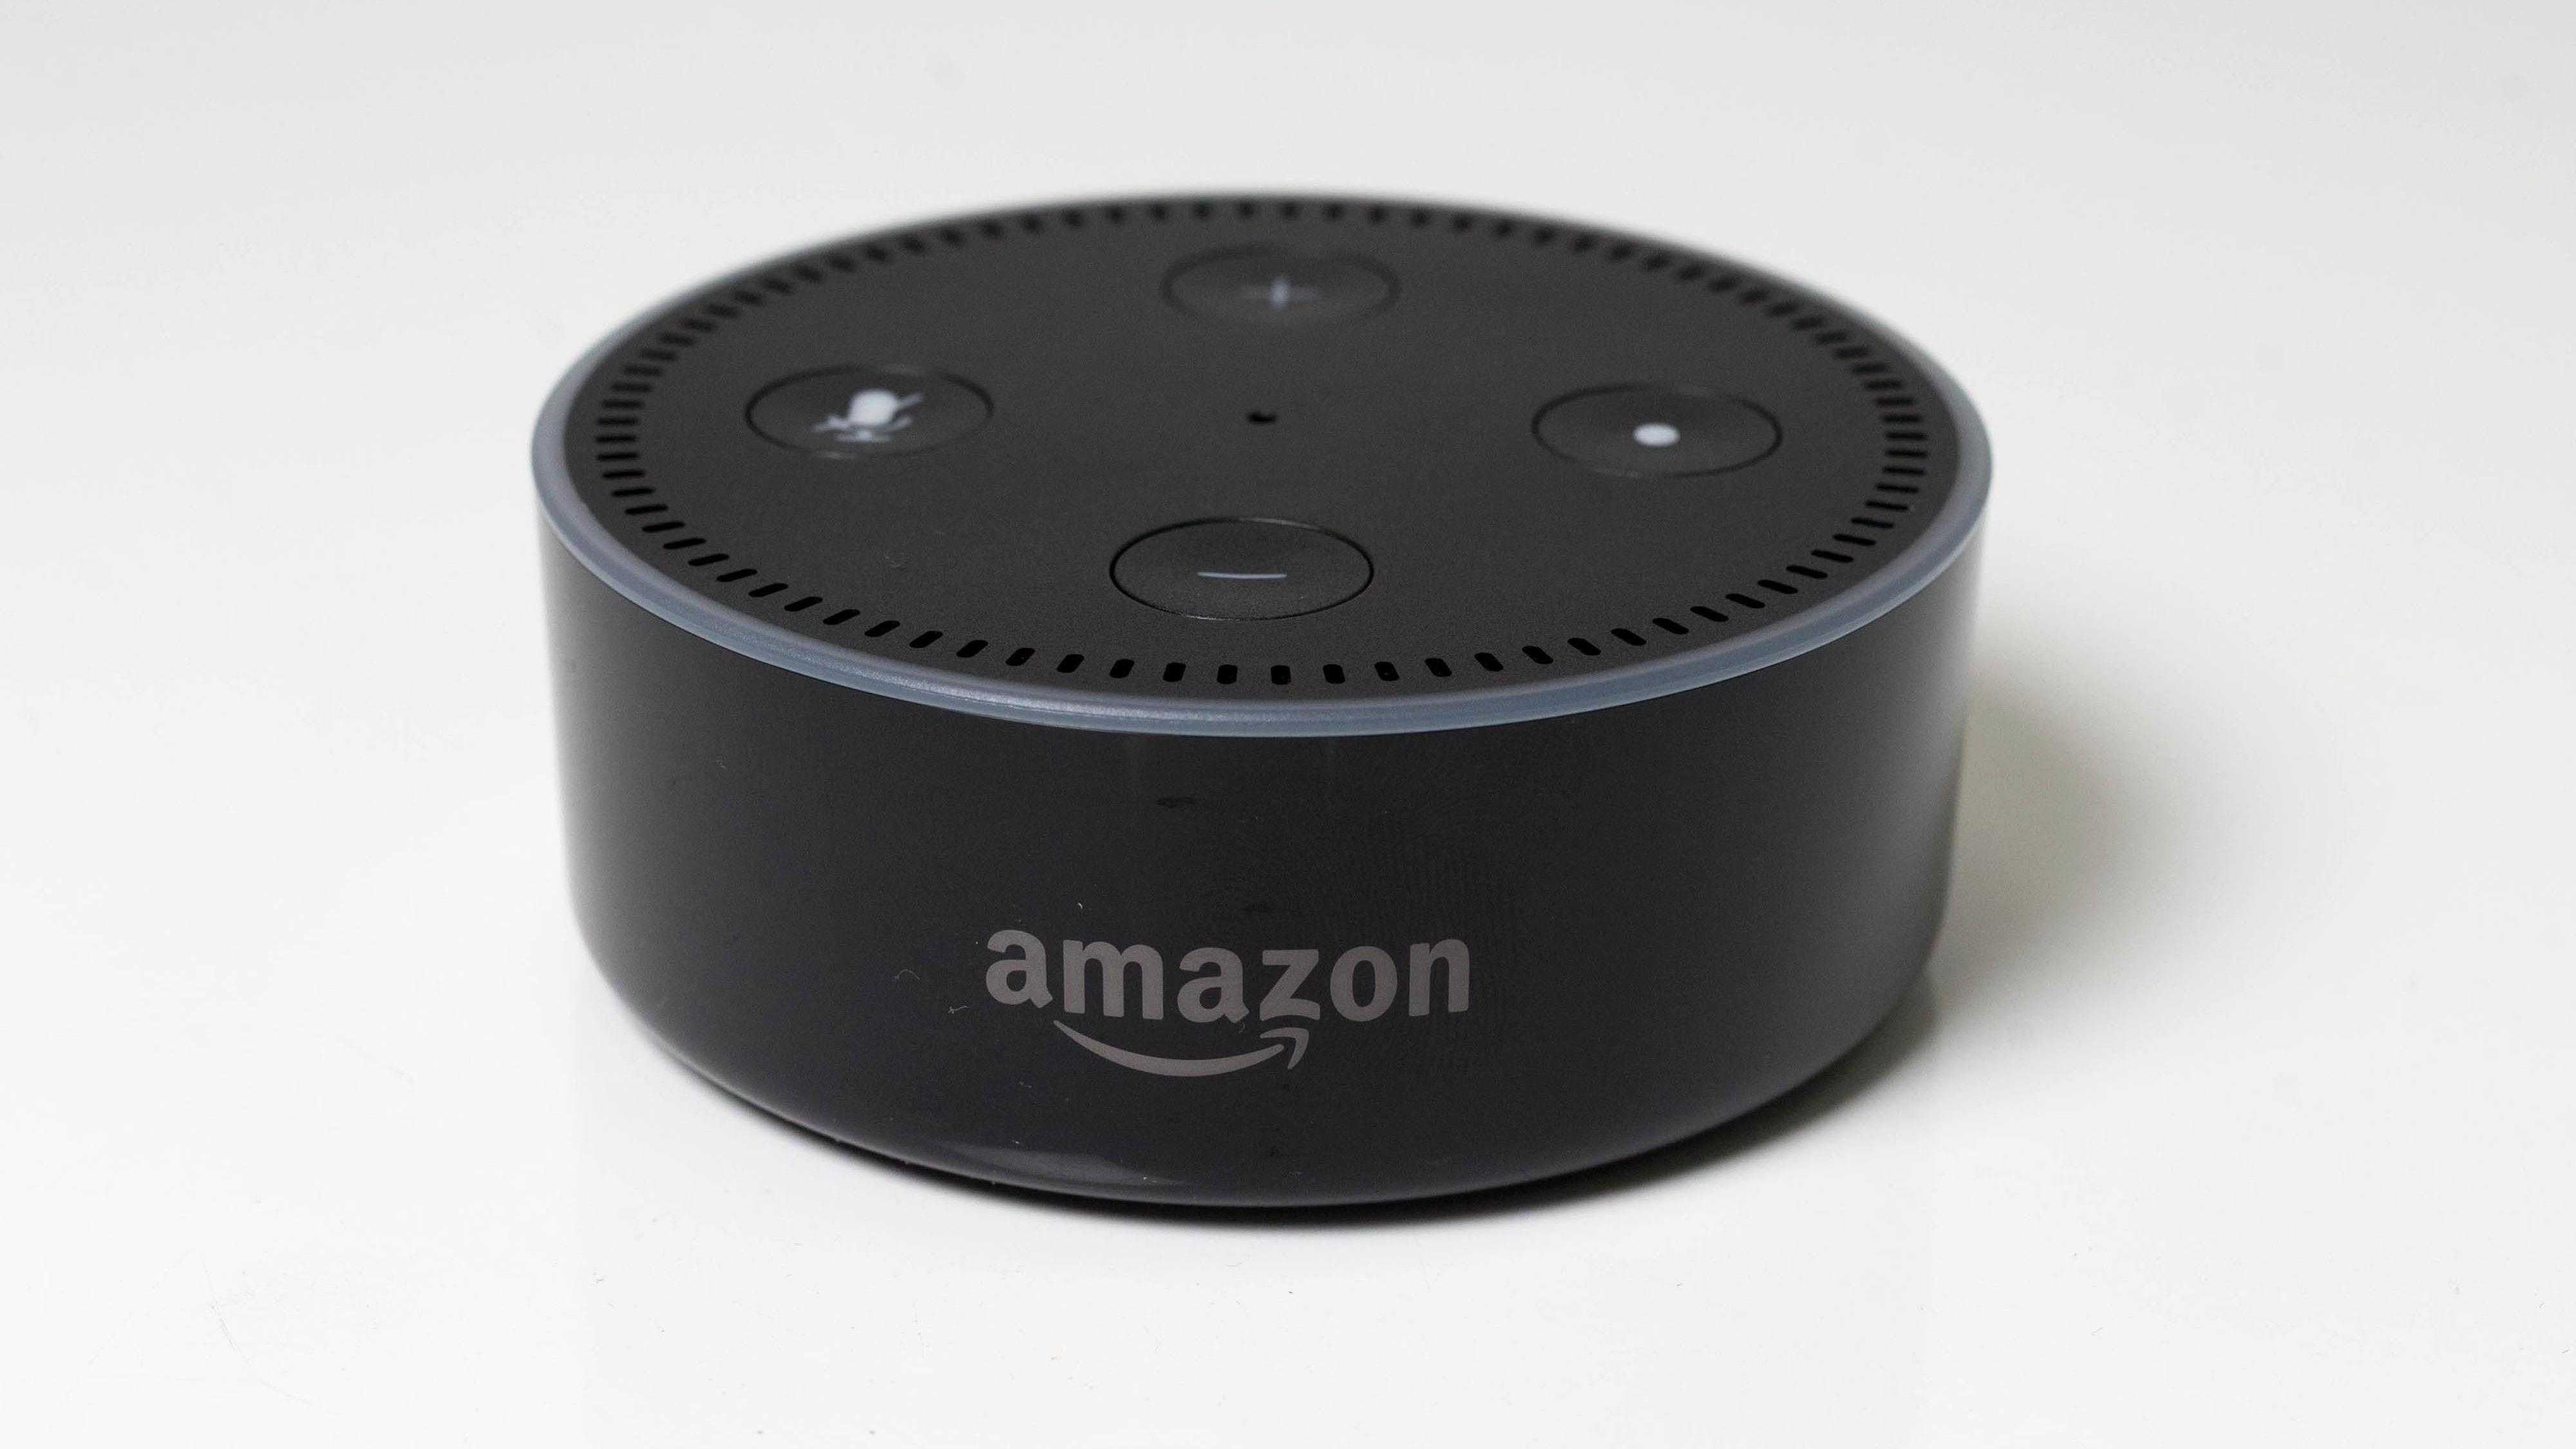 'Pac-Man' on Amazon Alexa isn't at all like 'Pac-Man'